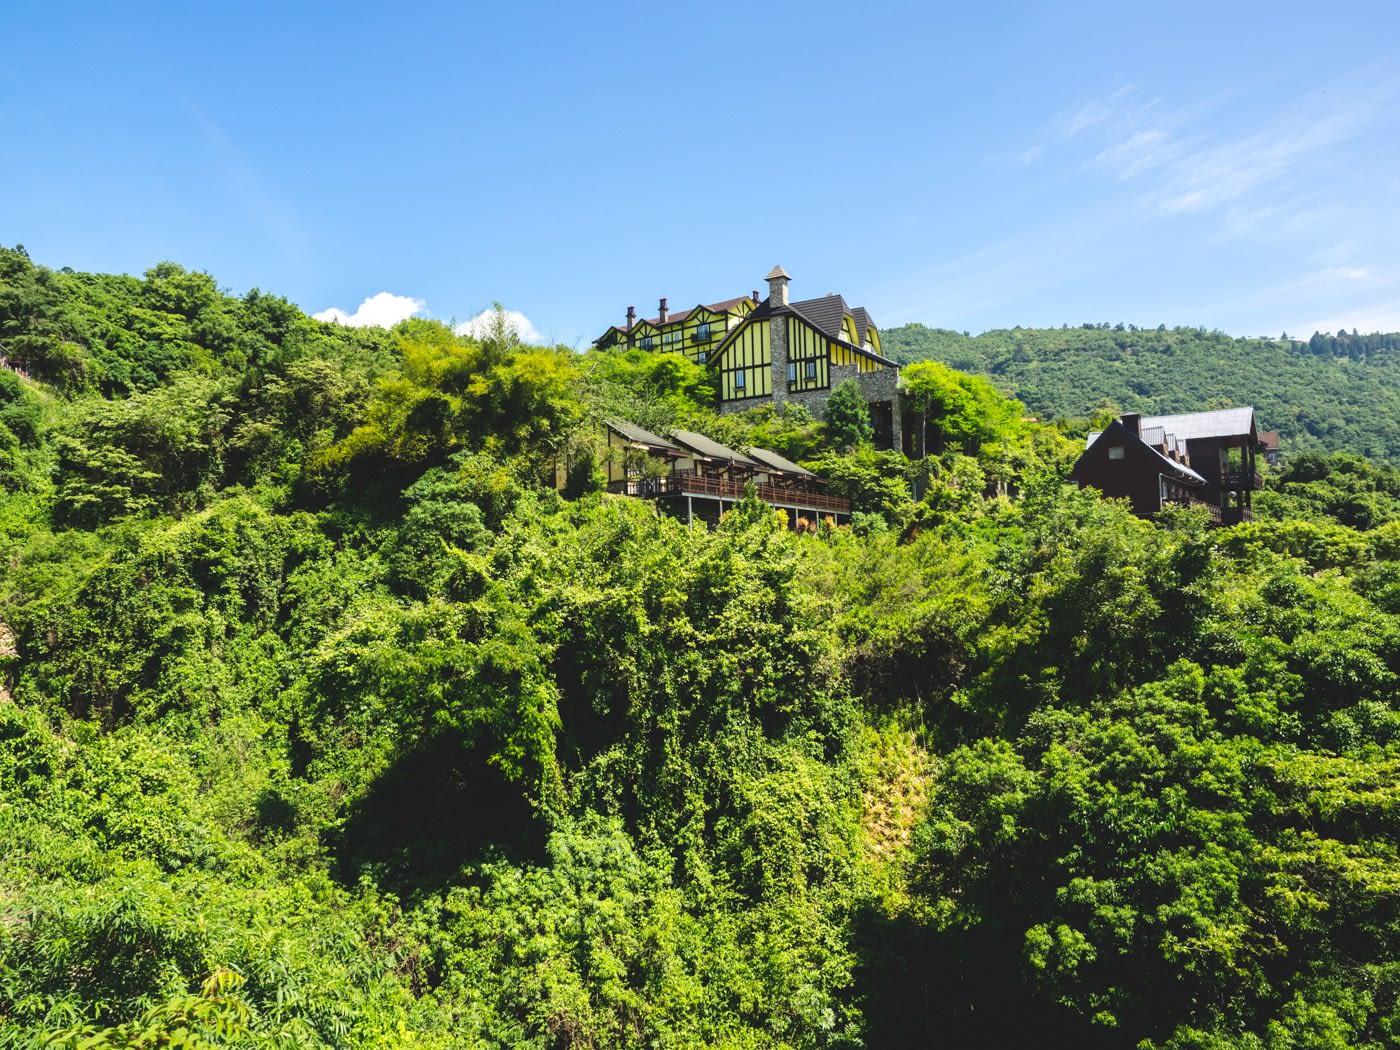 Taiwan - Qingjing - Yellow stripe house visually pleasing